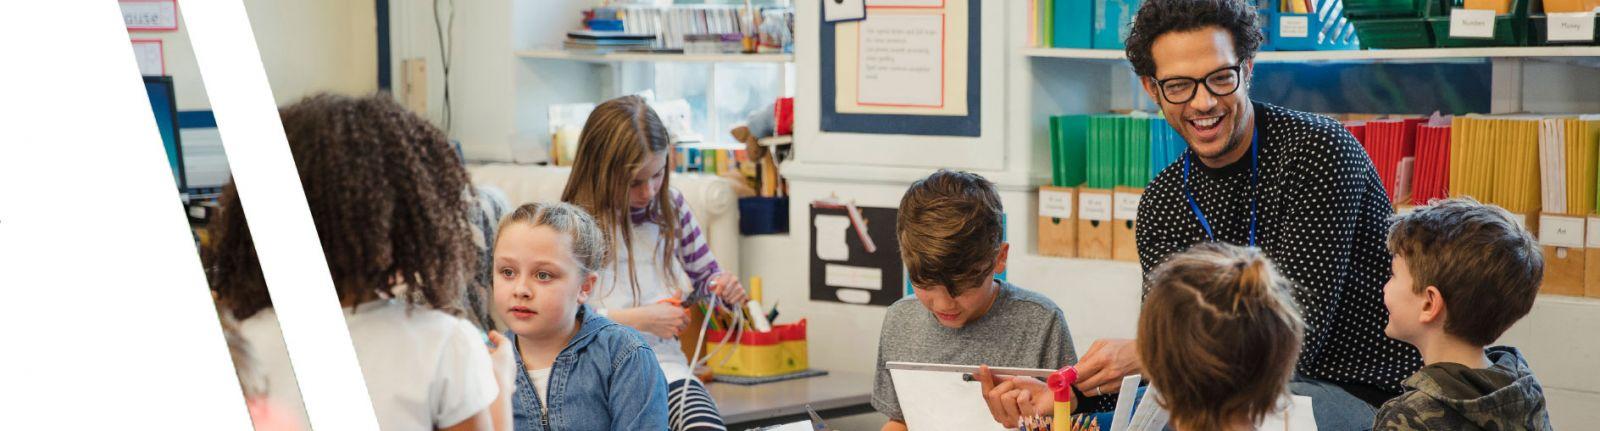 teacher intern in classroom